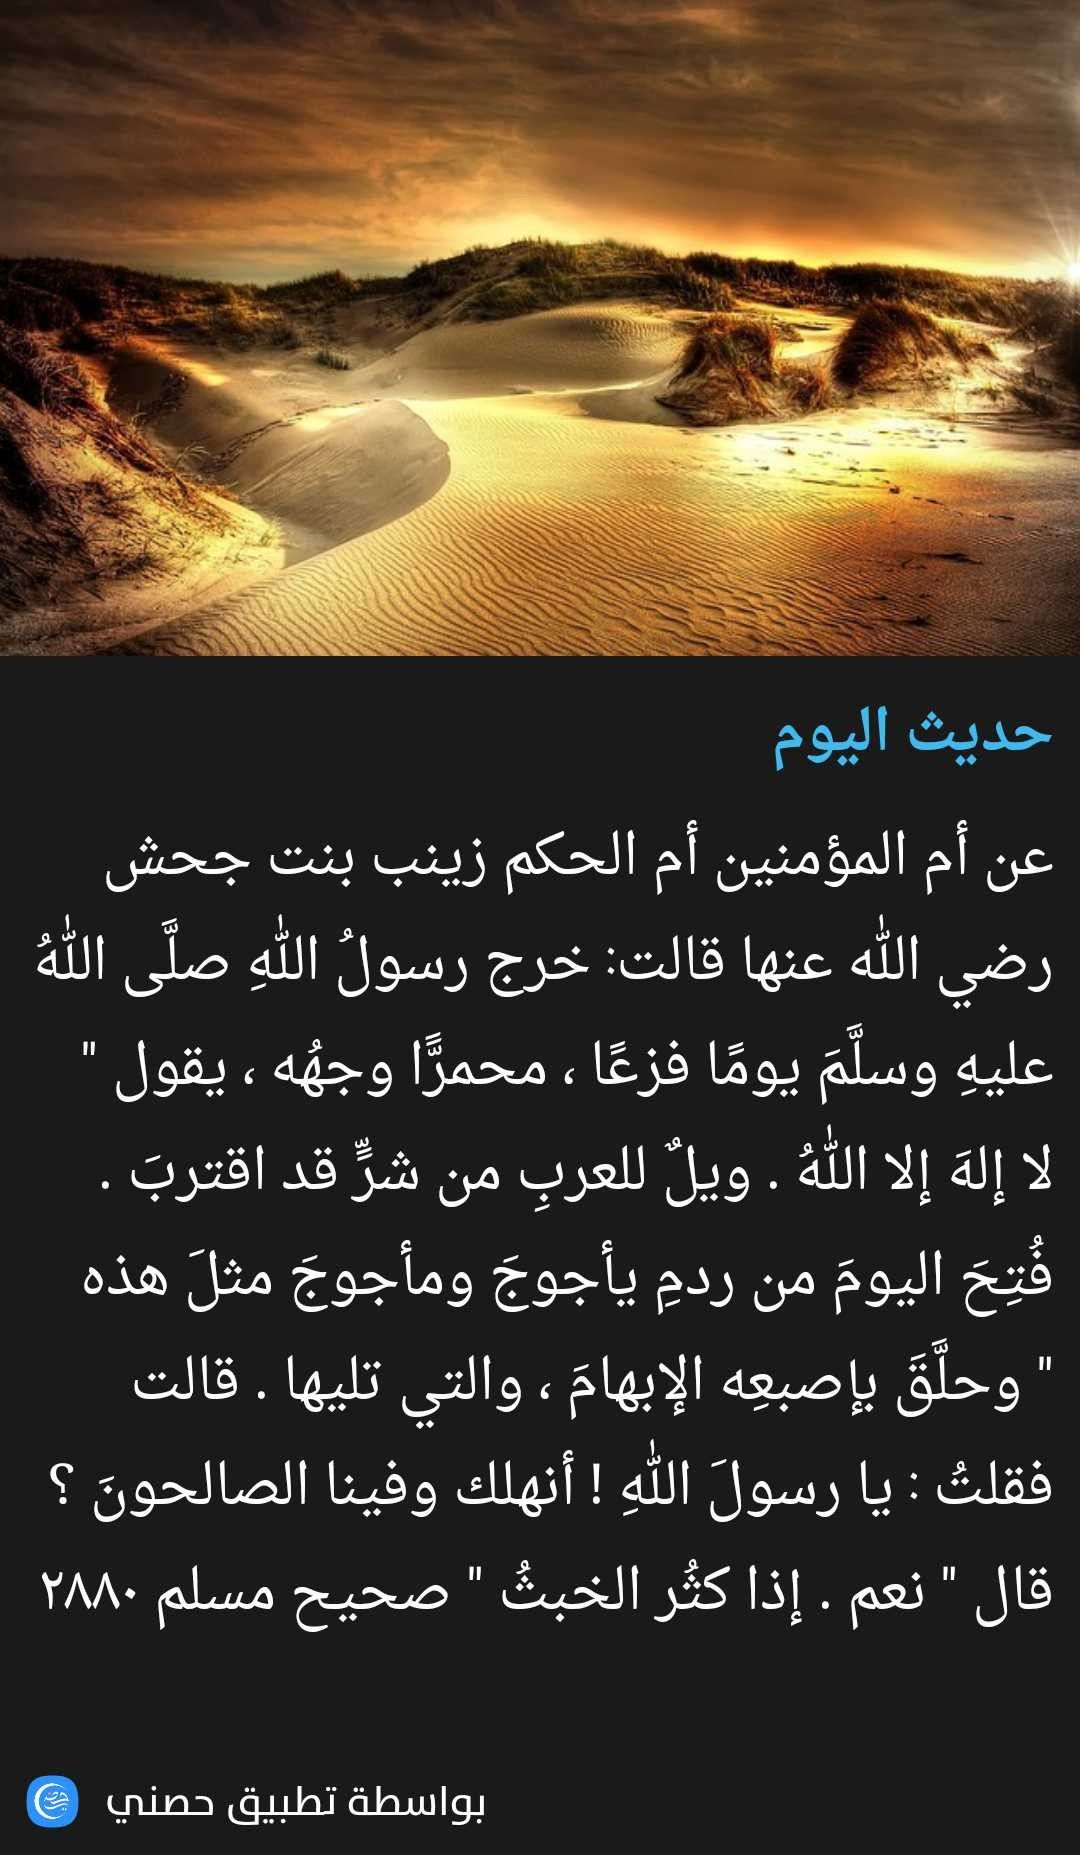 Pin By عبق الورد On أحاديث نبوية ٢ Ahadith Islamic Quotes Islam